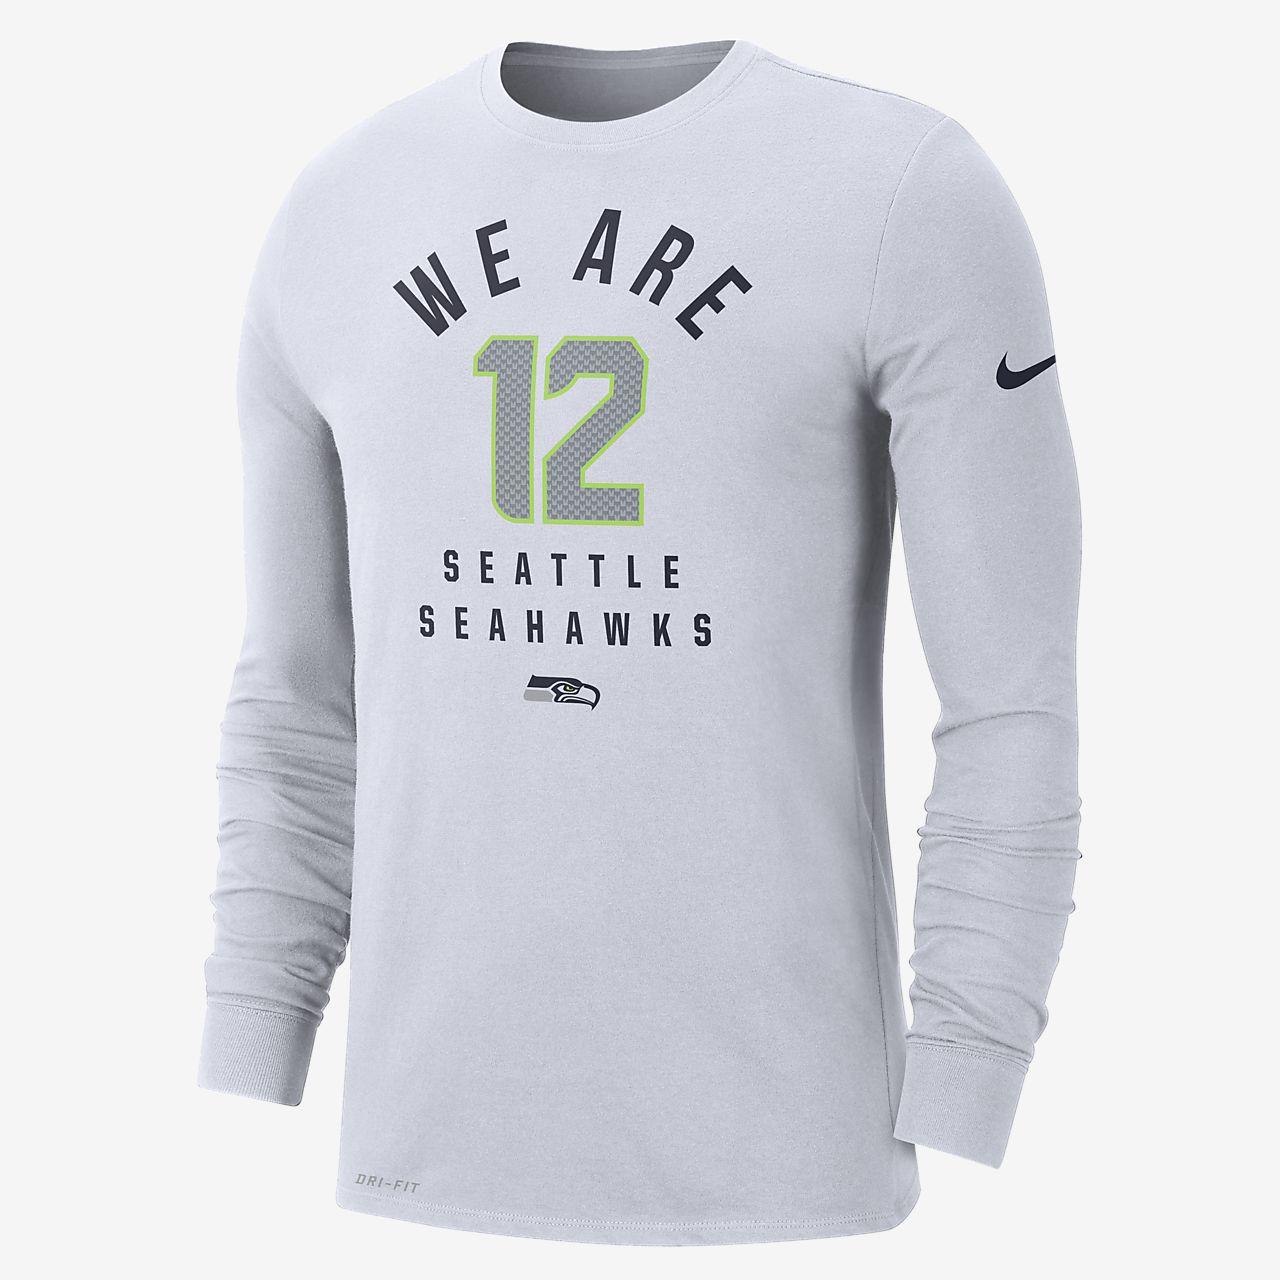 nike seahawks t shirt